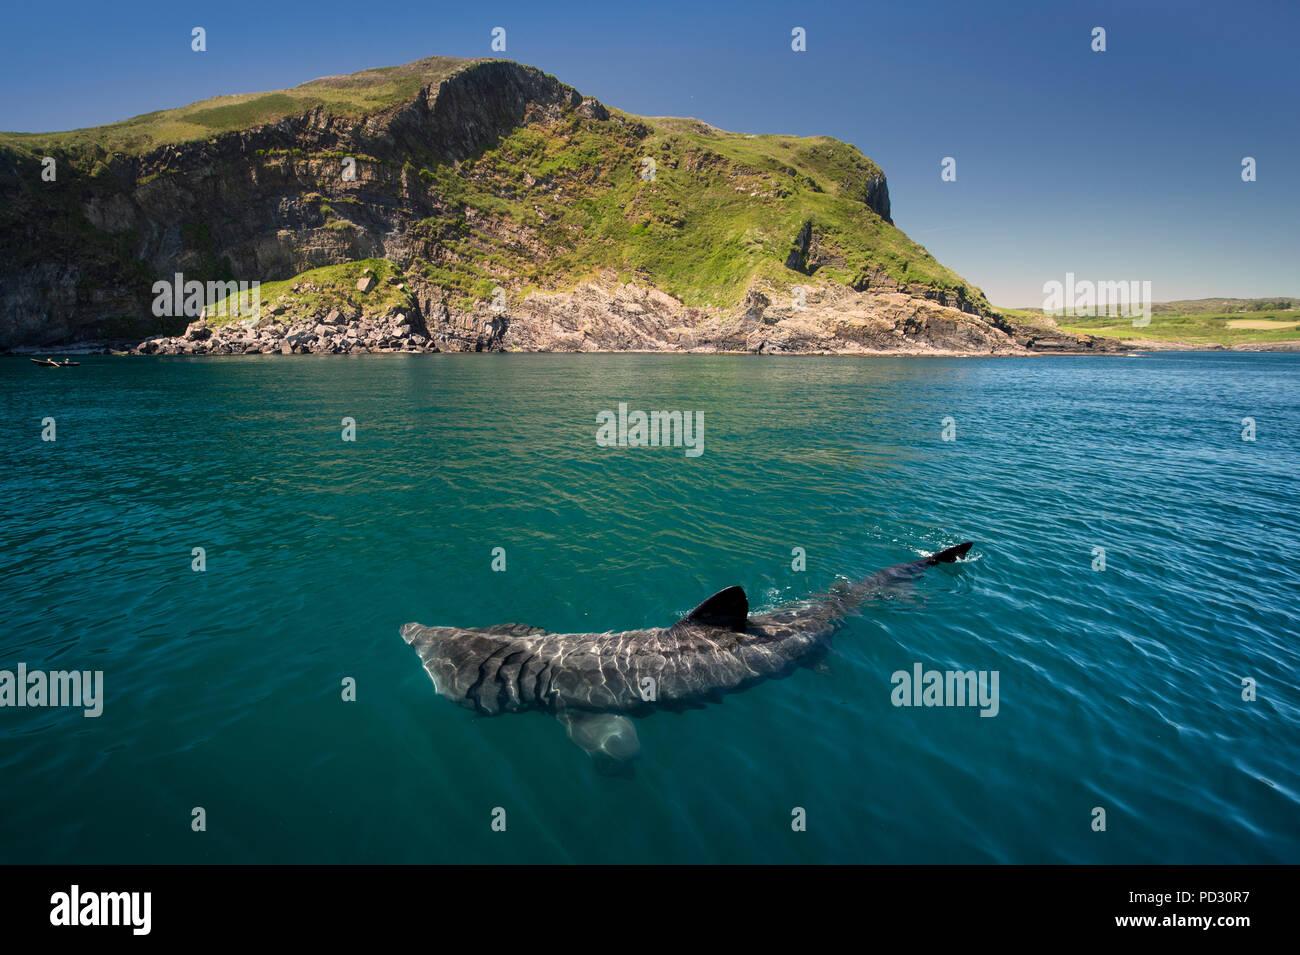 Basking shark (Cetorhinus maximus), Baltimore, Cork, Ireland - Stock Image